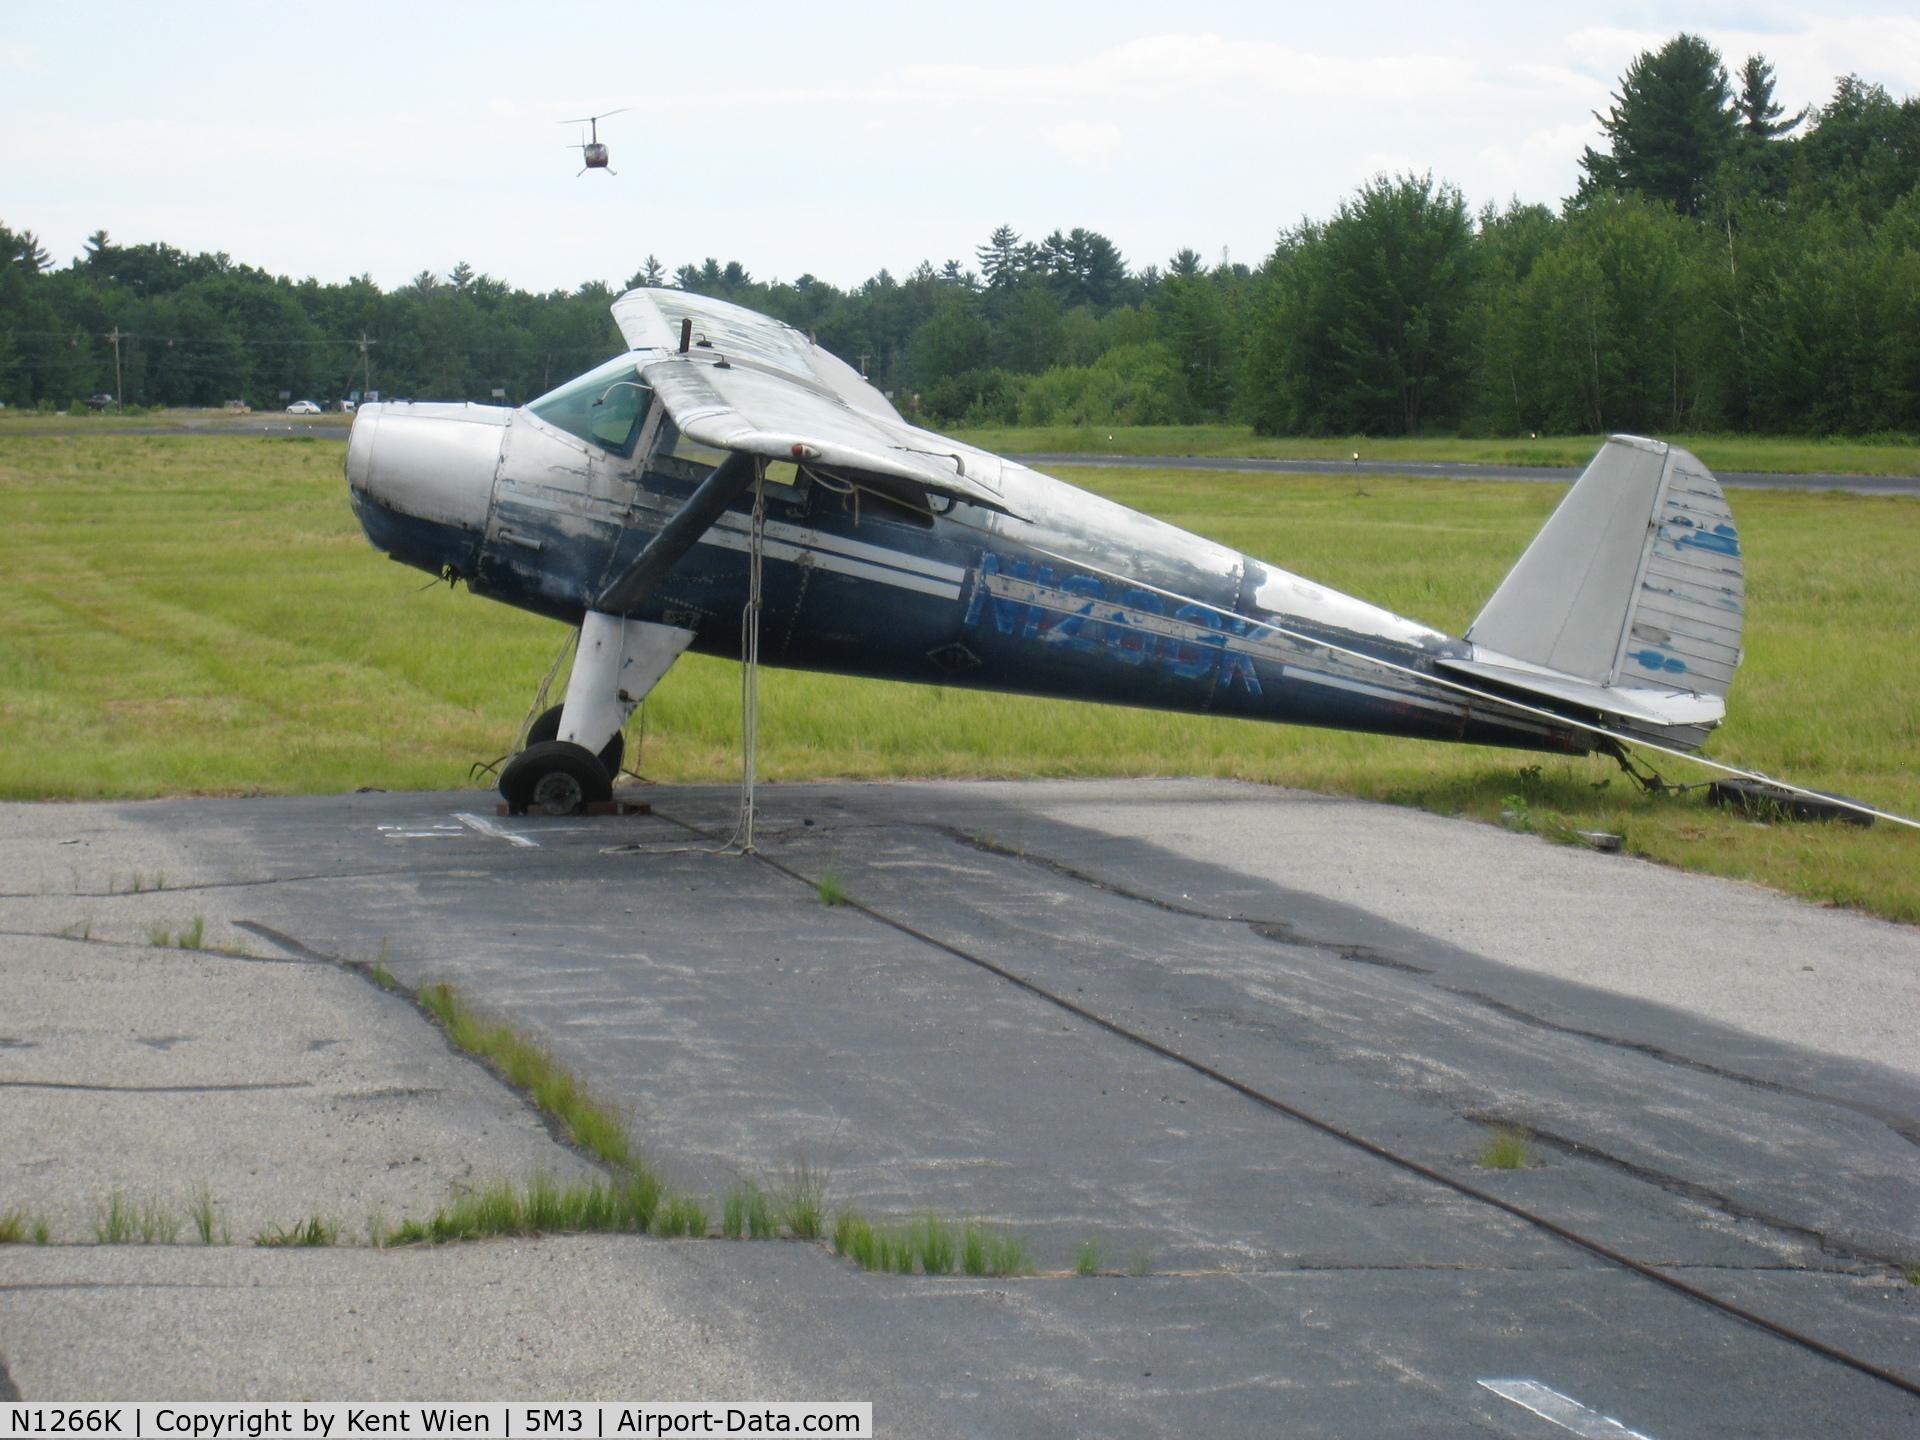 N1266K, 1946 Luscombe 8E Silvaire C/N 3993, Not looking good at Moultonboro airport